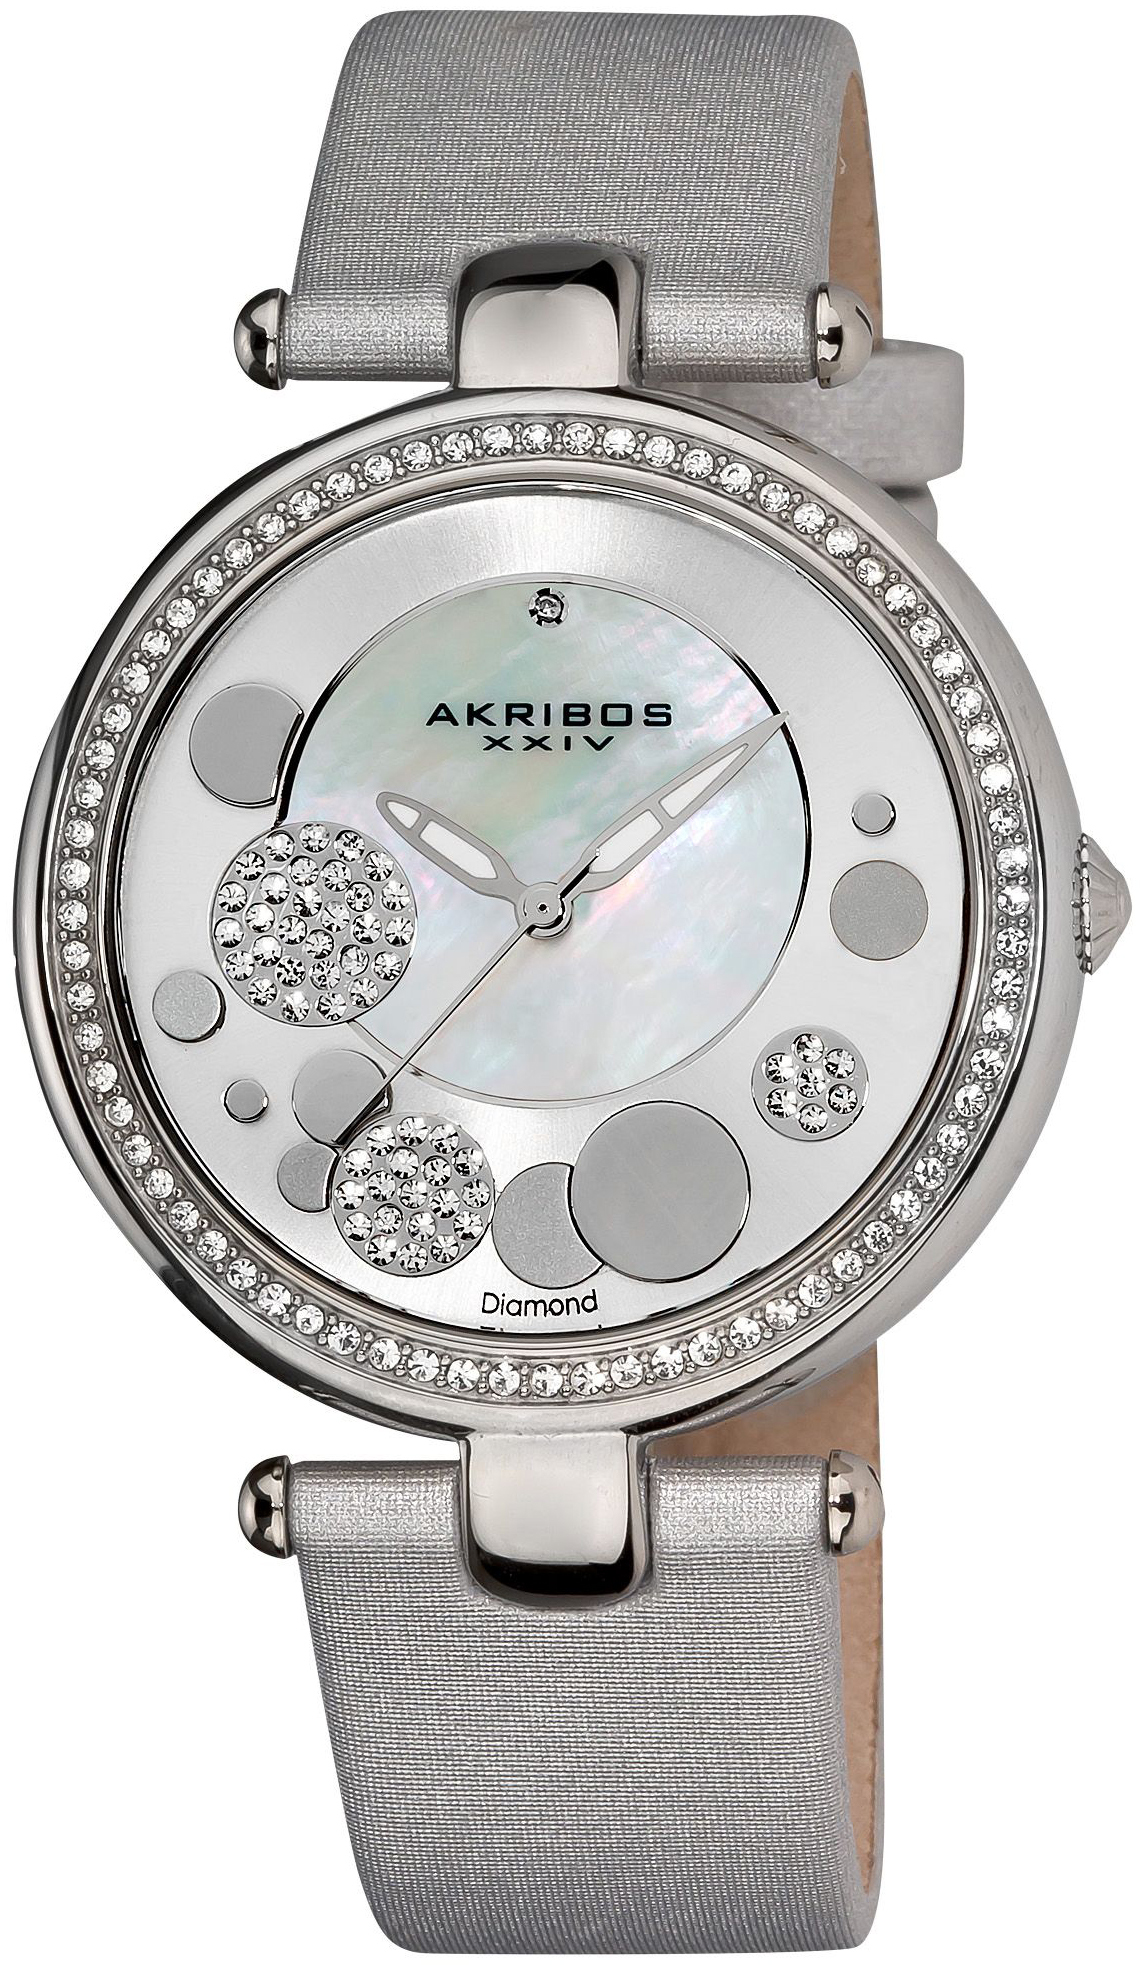 Akribos XXIV 99999 Damklocka AK434SL Silverfärgad/Läder Ø40 mm - Akribos XXIV